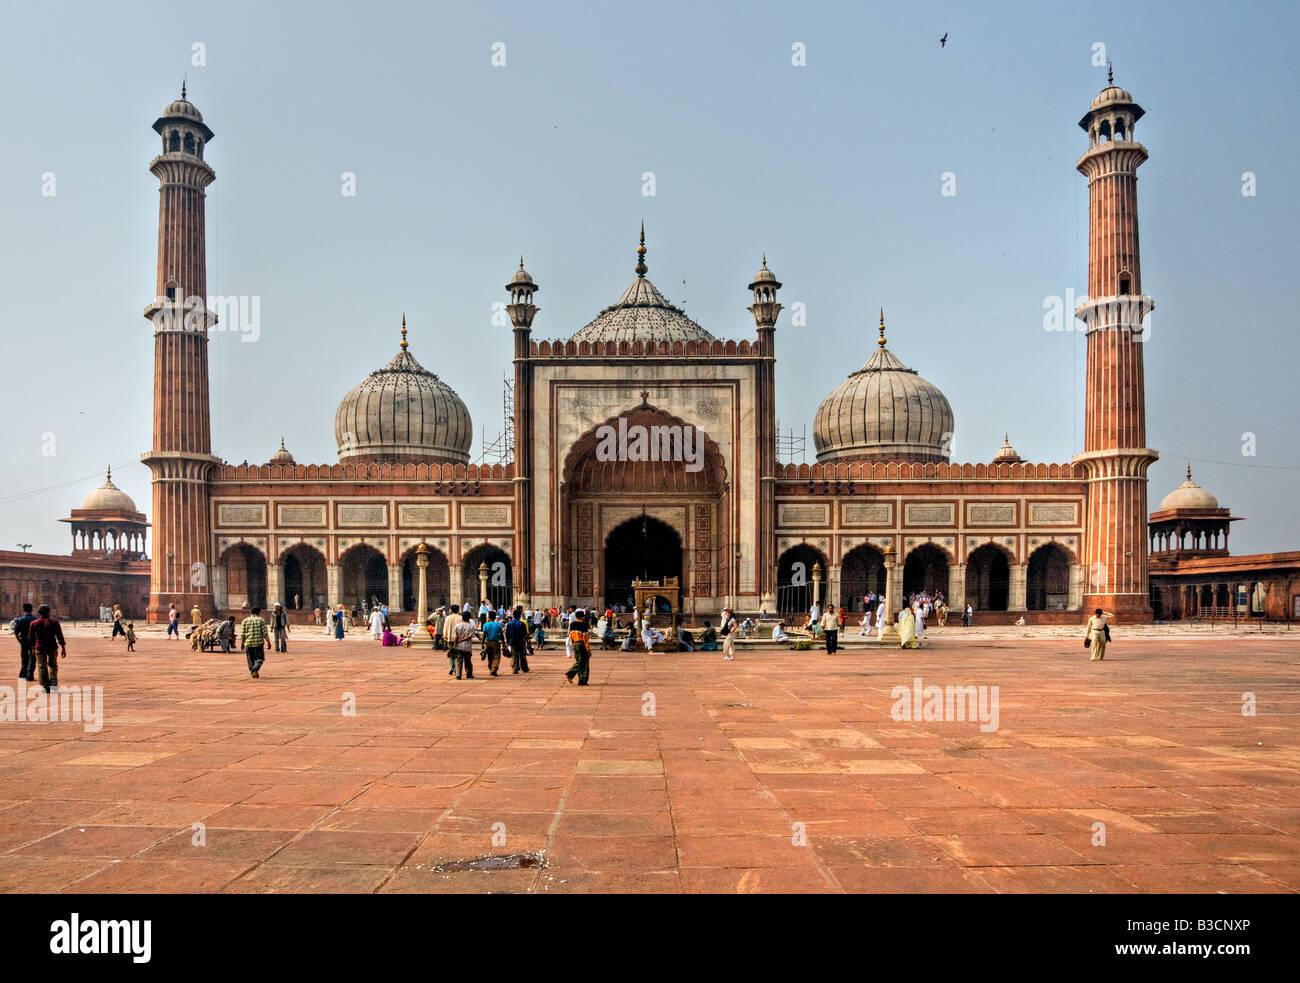 Jama Masjid Mosque old Delhi India Stock Photo